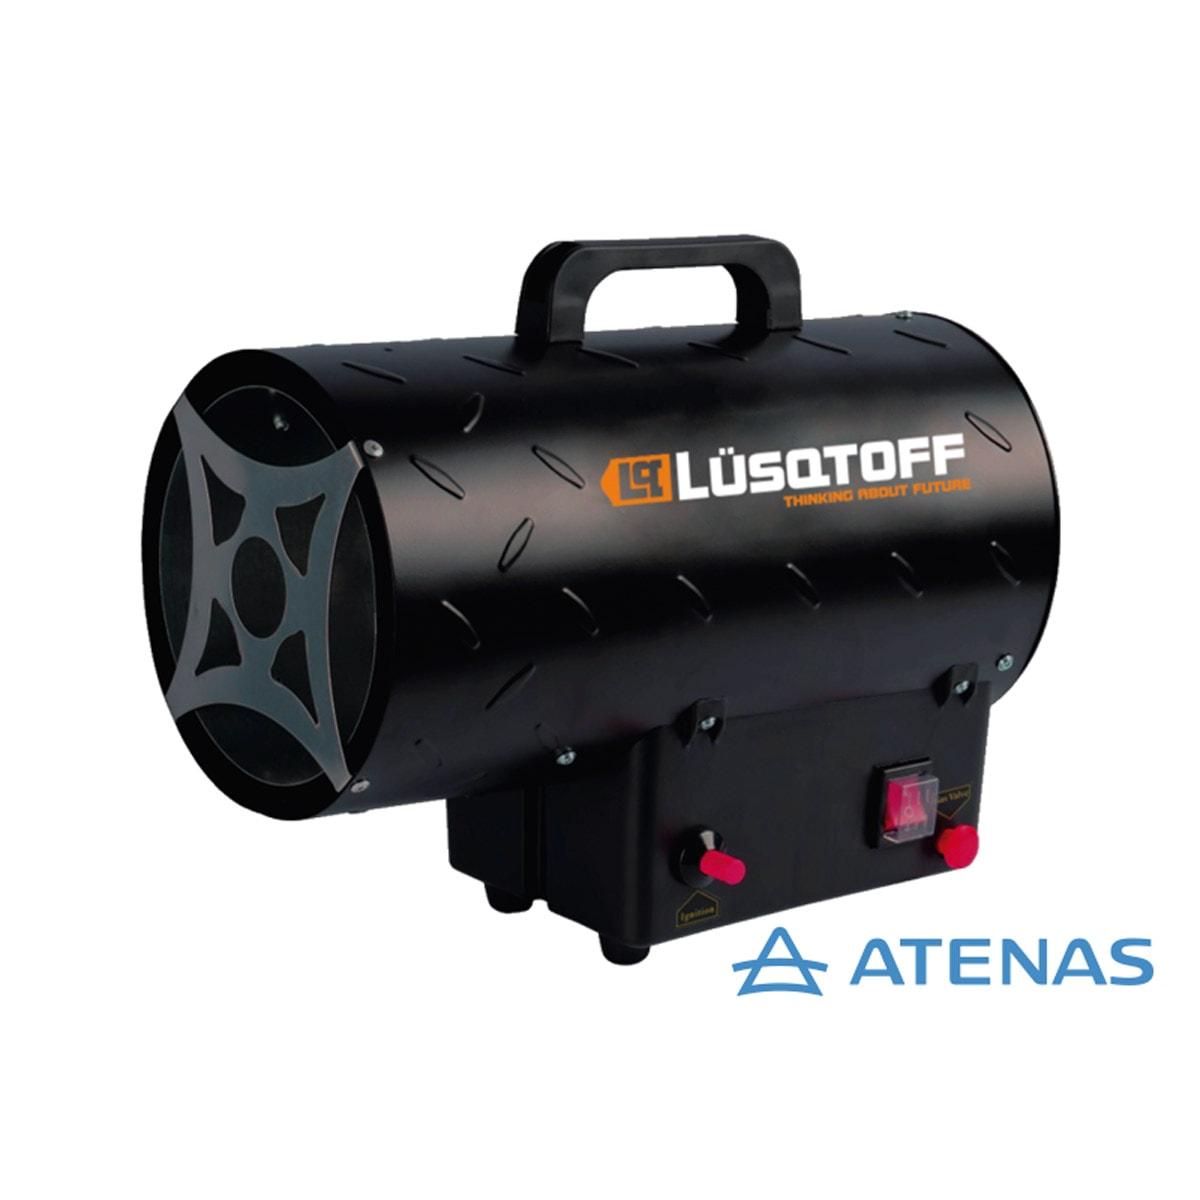 Mini Calefactor Cañon a Gas 13000 Calorías Lusqtoff HTBGA-15A